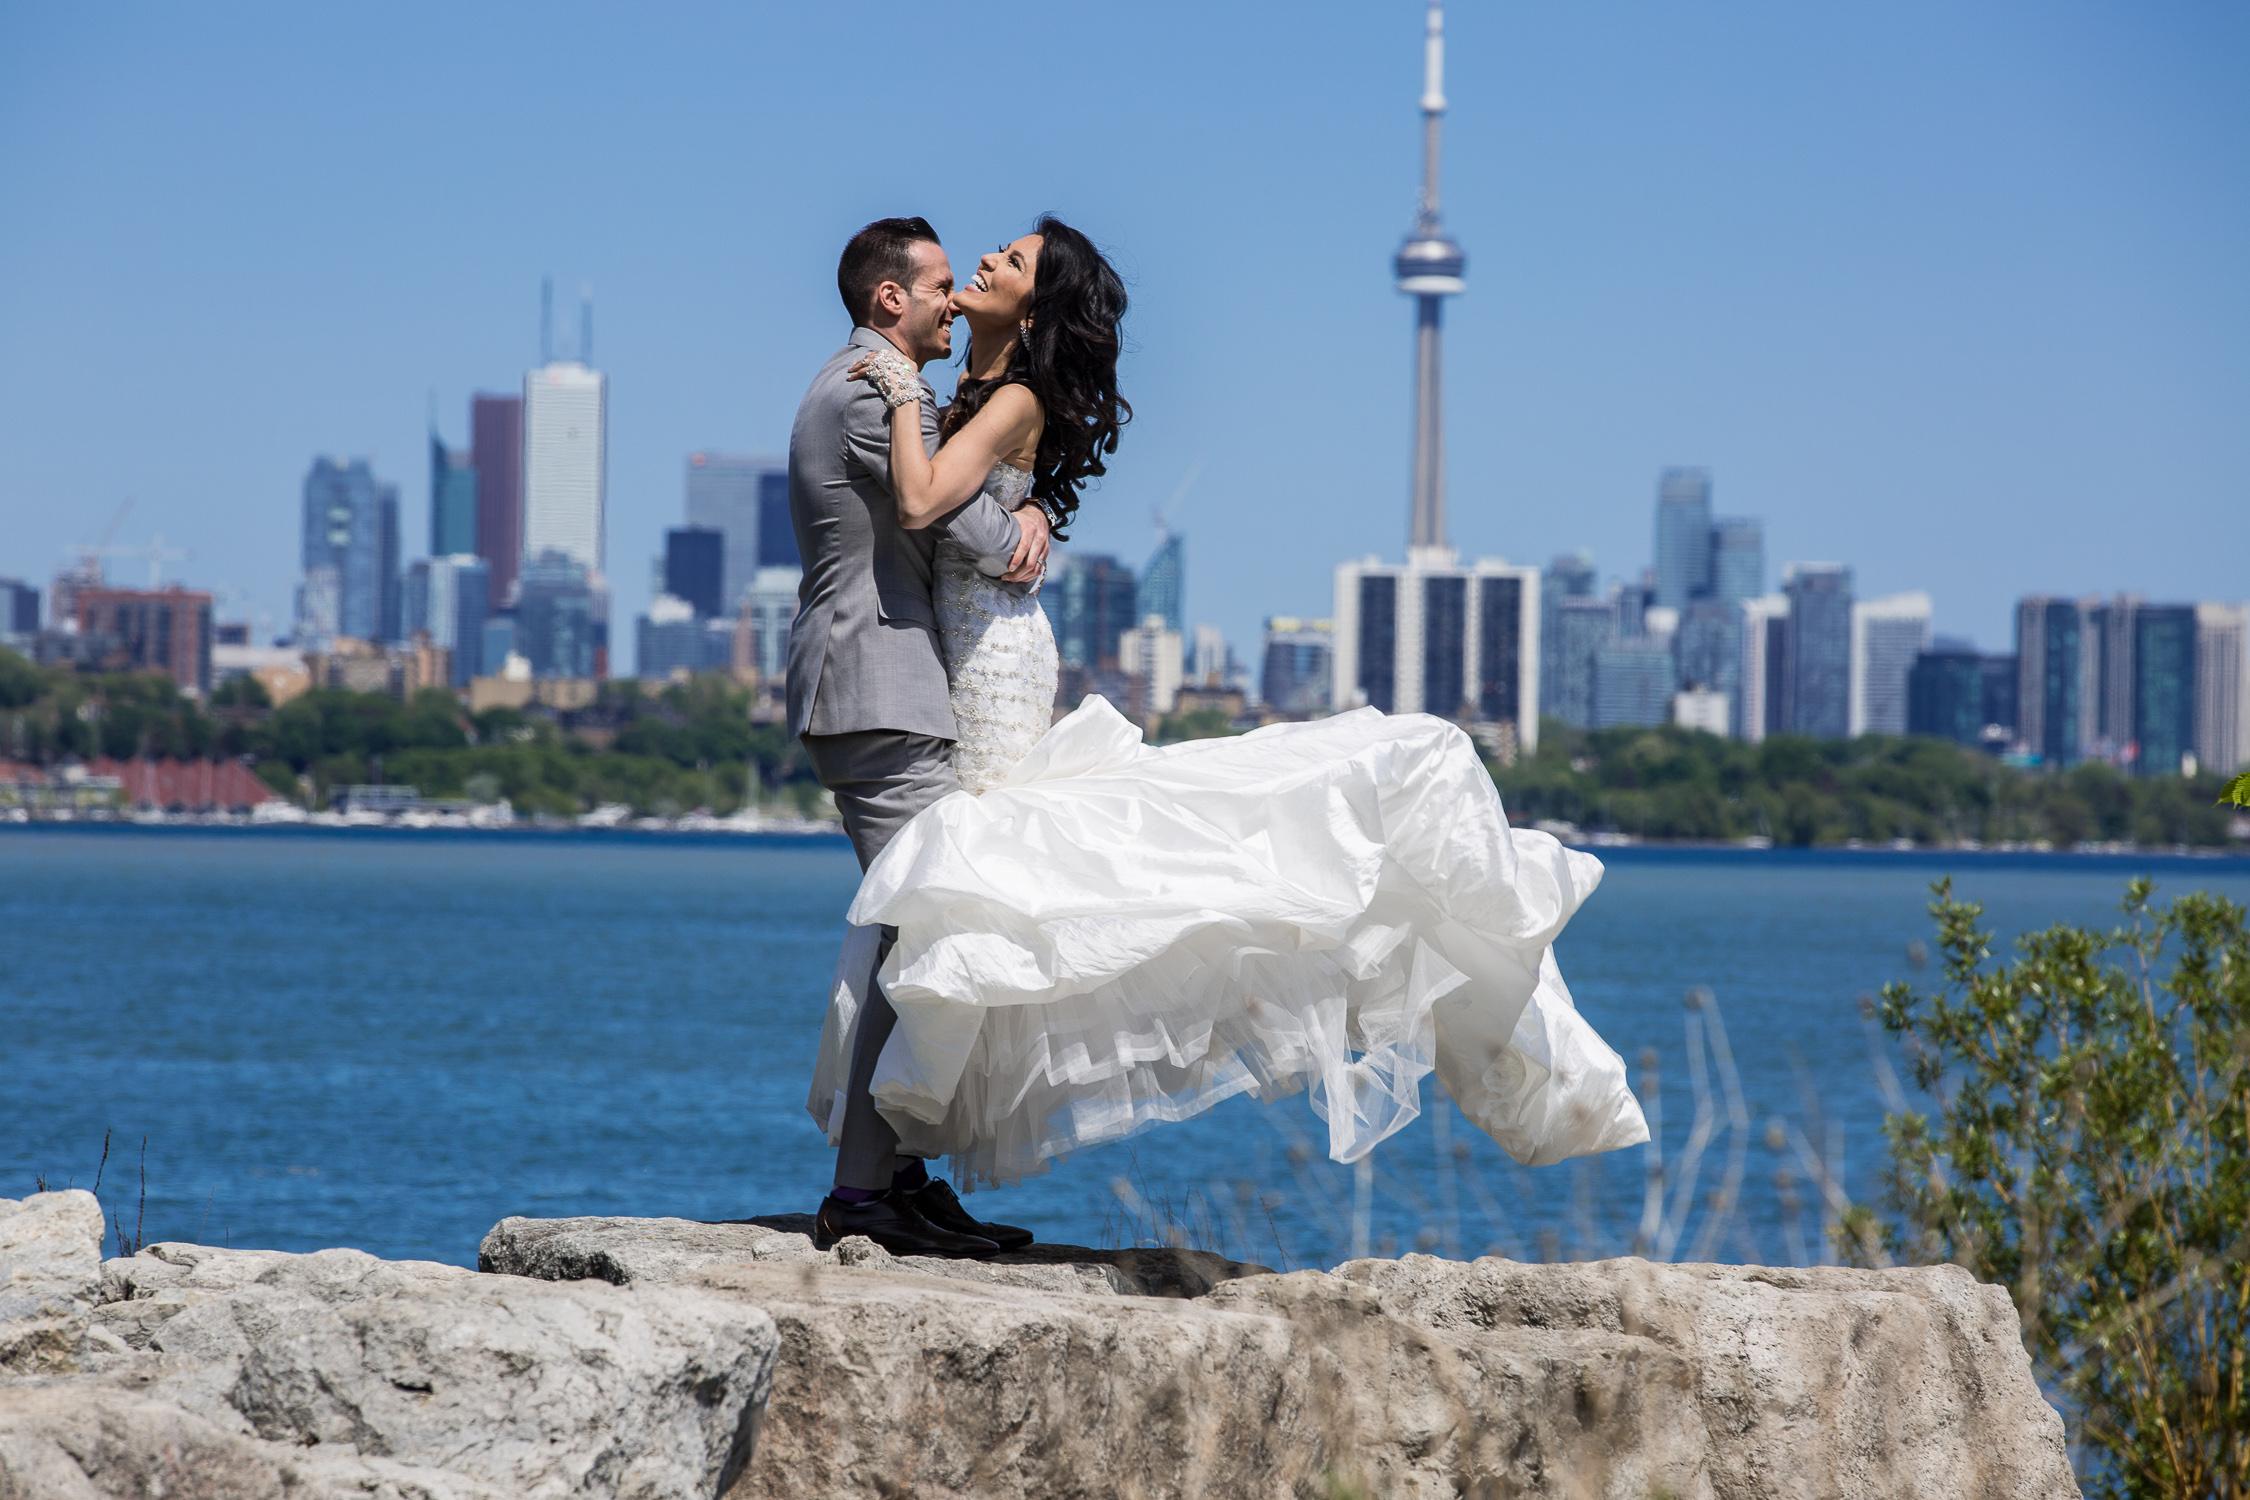 Paradise-Banquet-Hall-Wedding-Vaughan-Ontario-0064.jpg